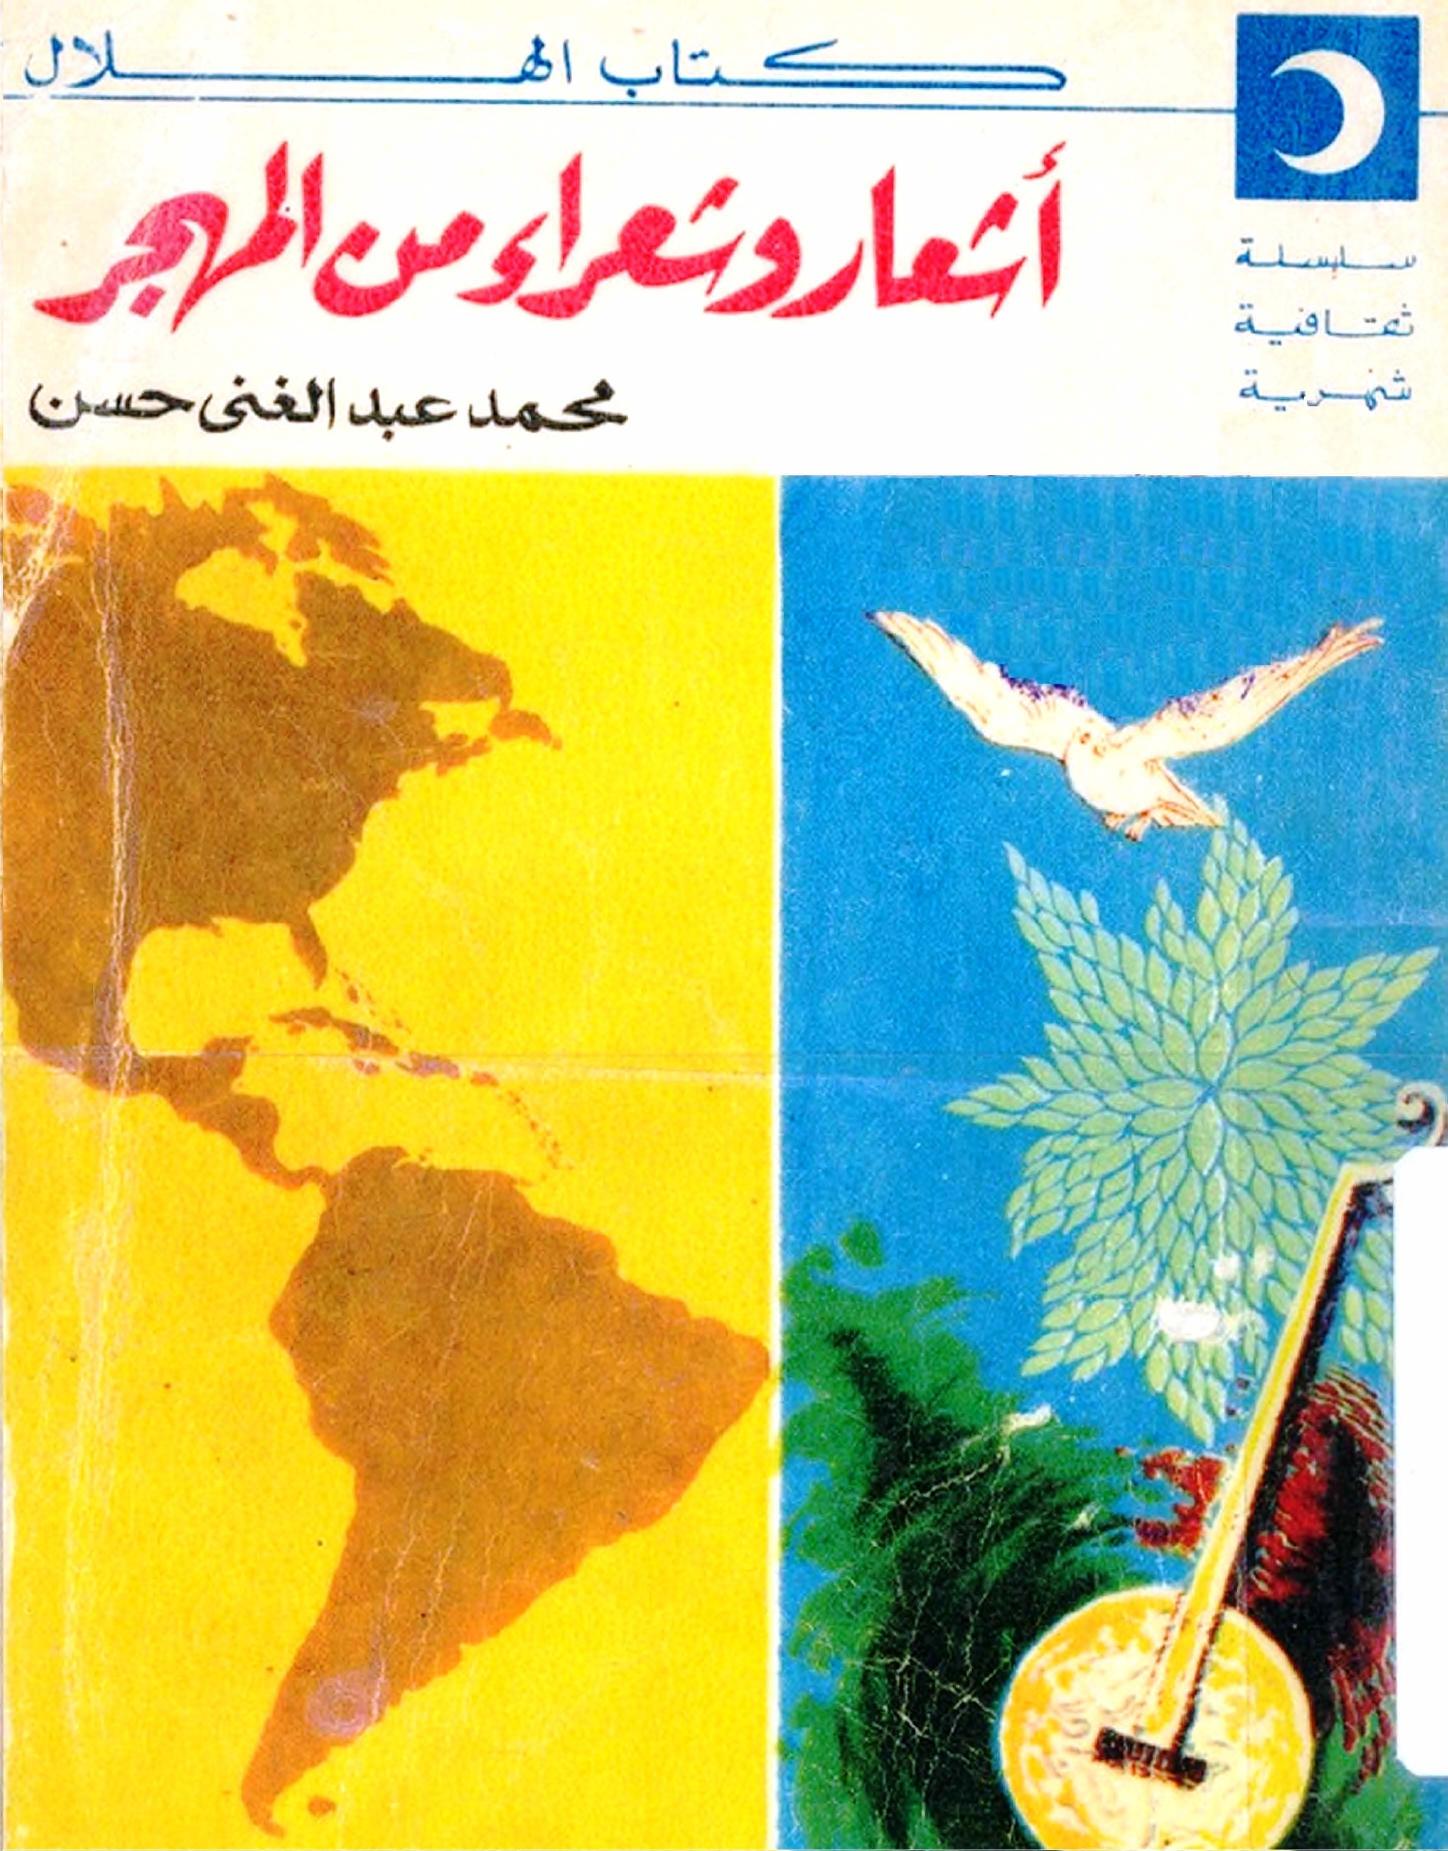 "Mohammed Abdul Ghani Hassan, ""Ashaár wa shuaára min al-Mahjar"" (Poems and Poets from the Diaspora), Kitab al-Hilal, number 266, February 1973."